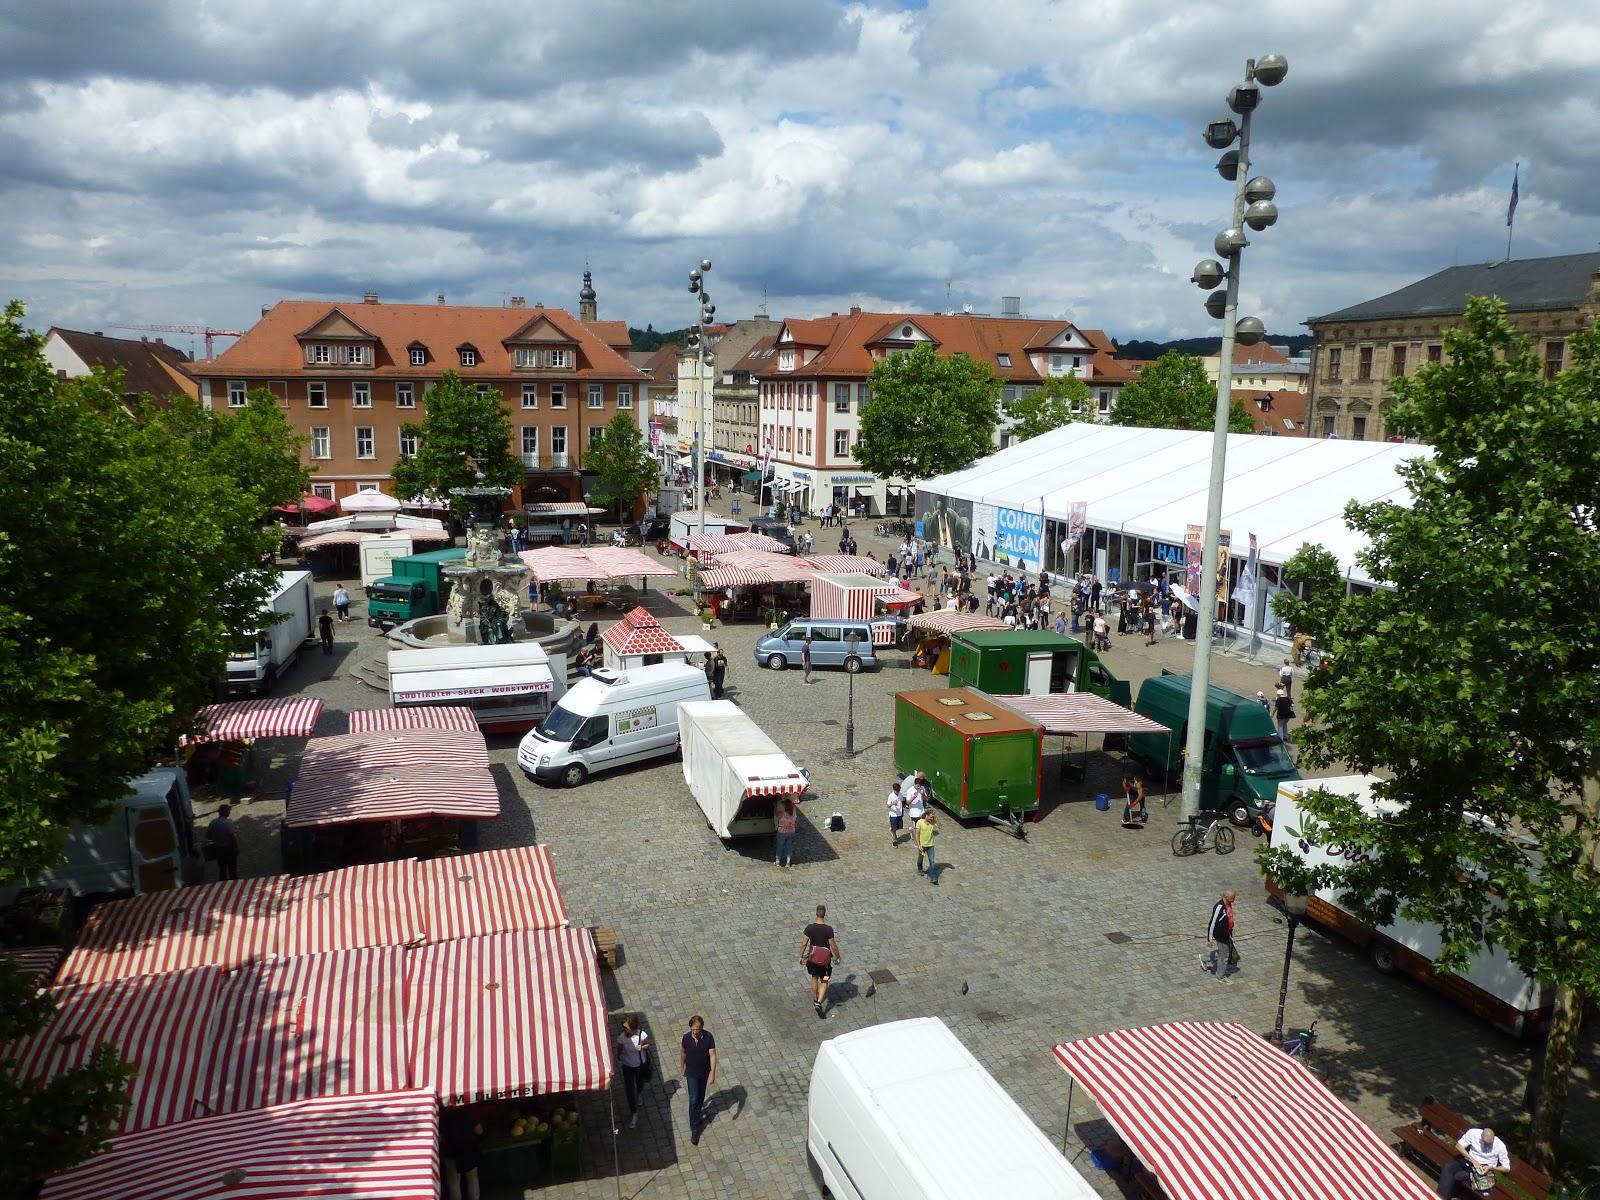 Traena festival report 2011, part 8: Was nach der Höhle kam ...